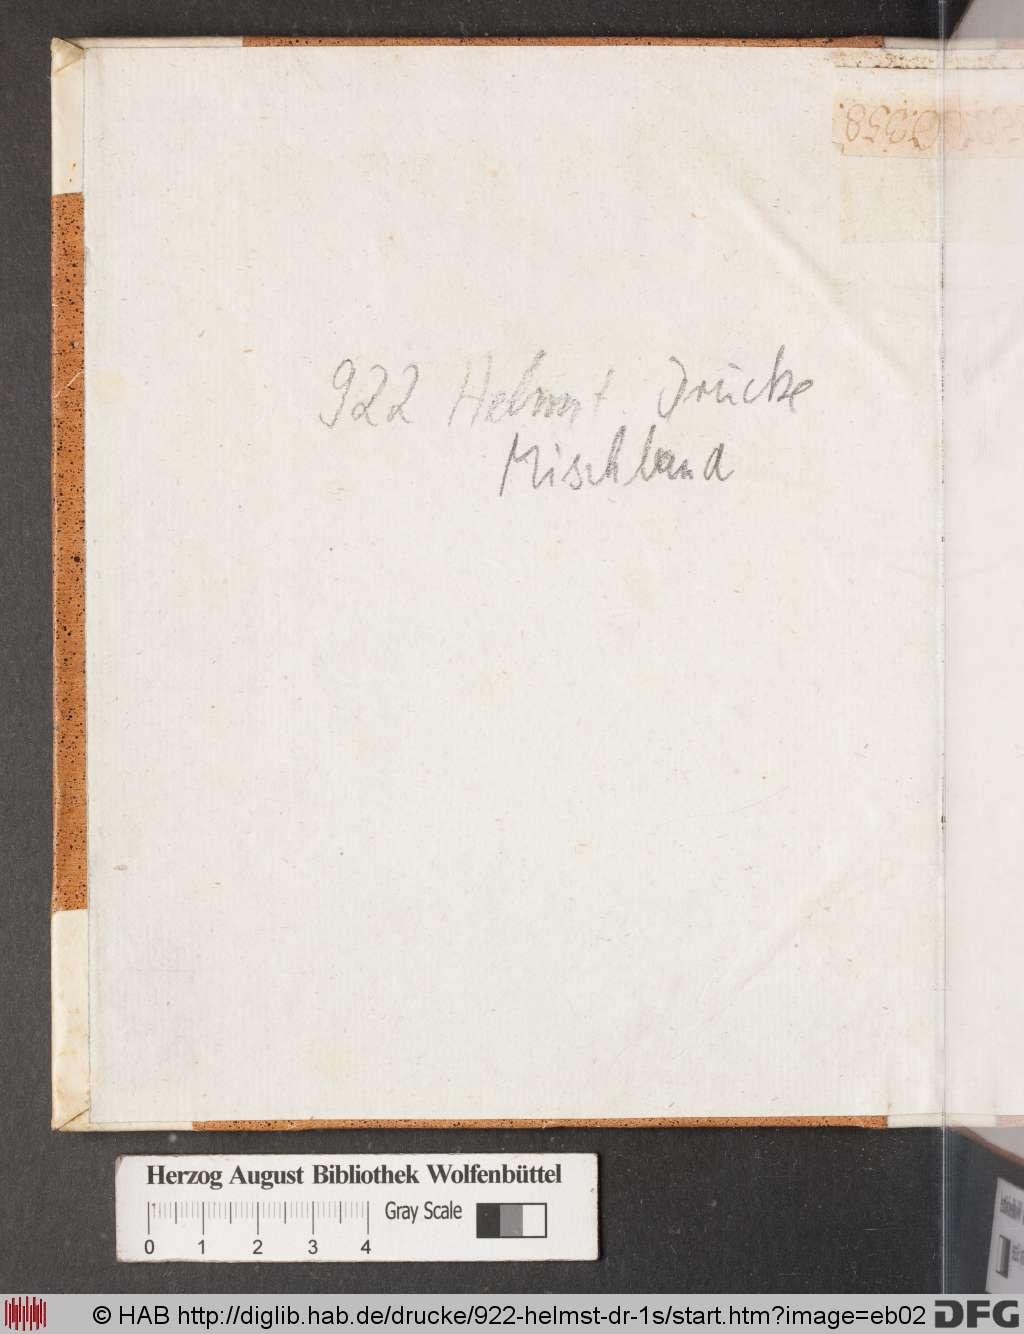 http://diglib.hab.de/drucke/922-helmst-dr-1s/eb02.jpg